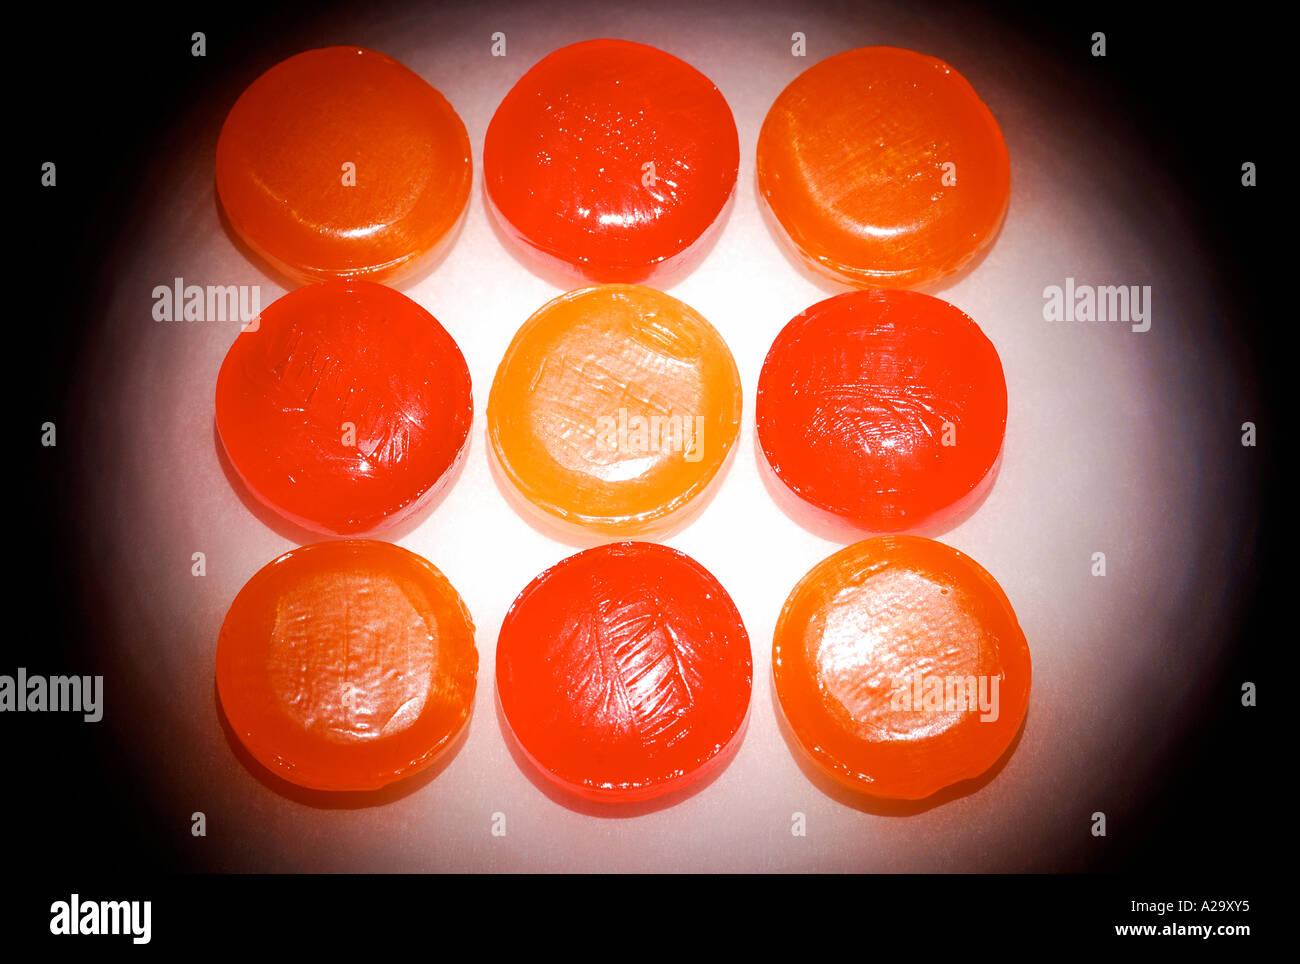 Orange lozenges, close-up, elevated view - Stock Image